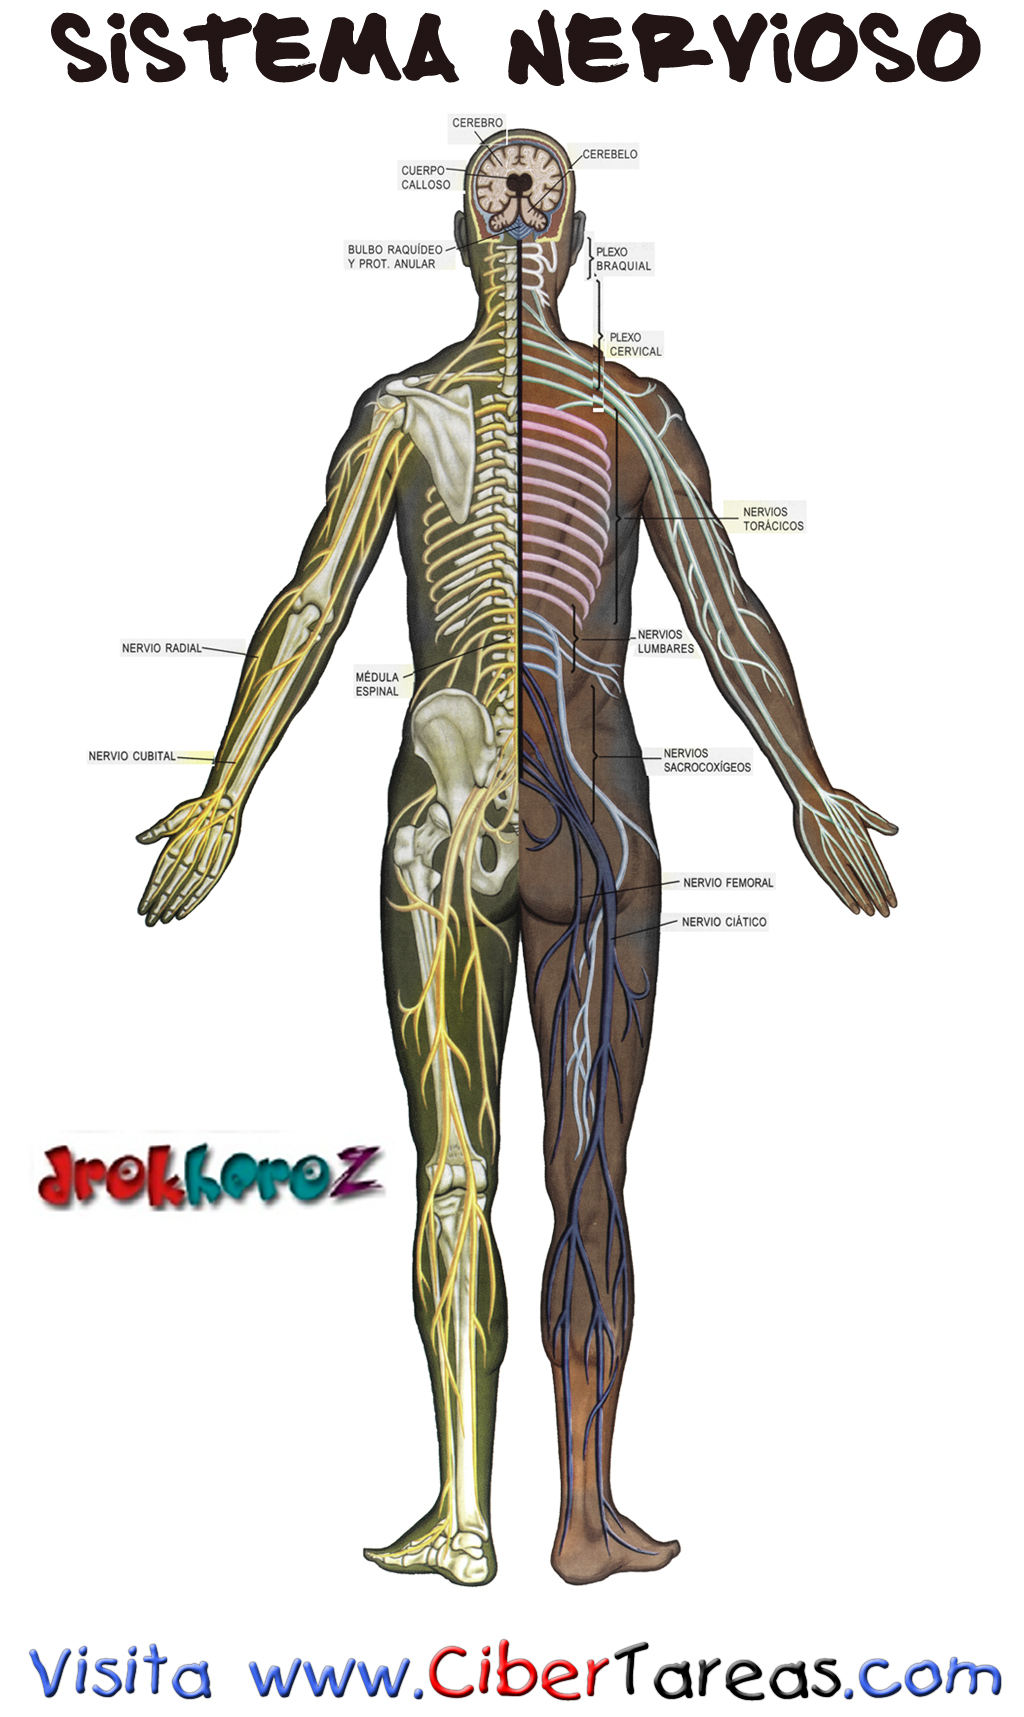 Sistema Nervioso | CiberTareas